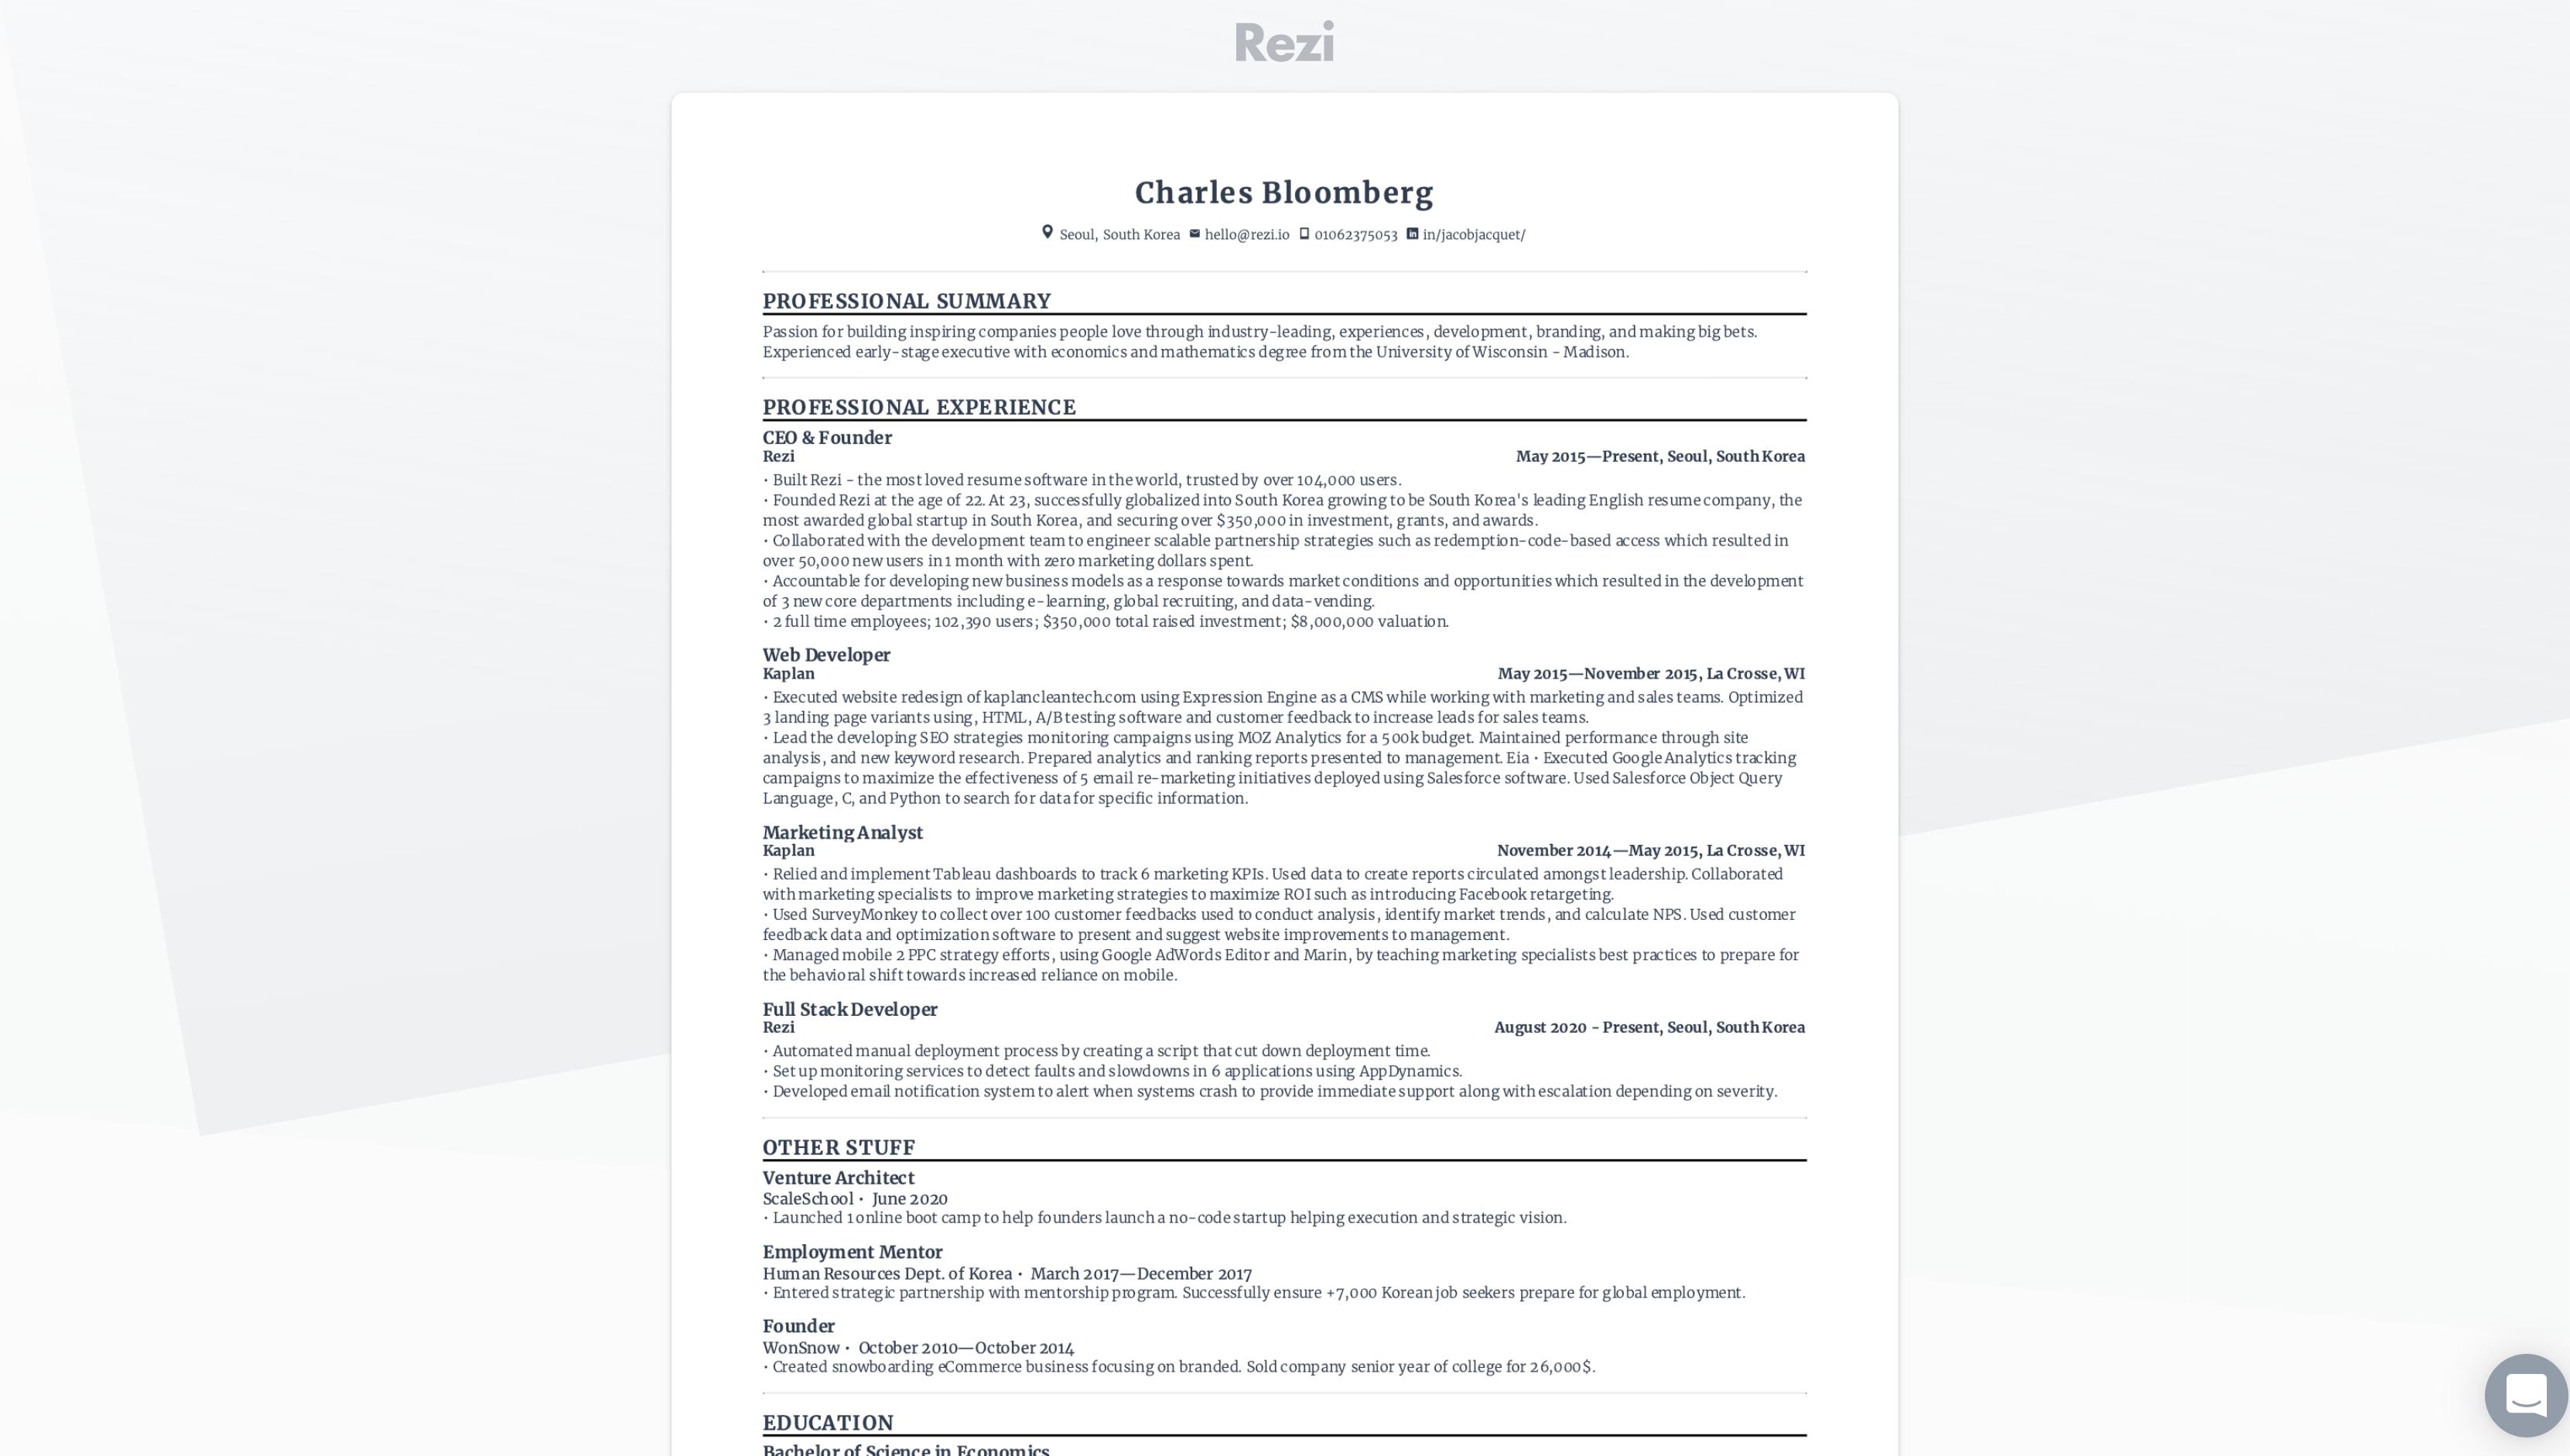 Resume Link Sharing